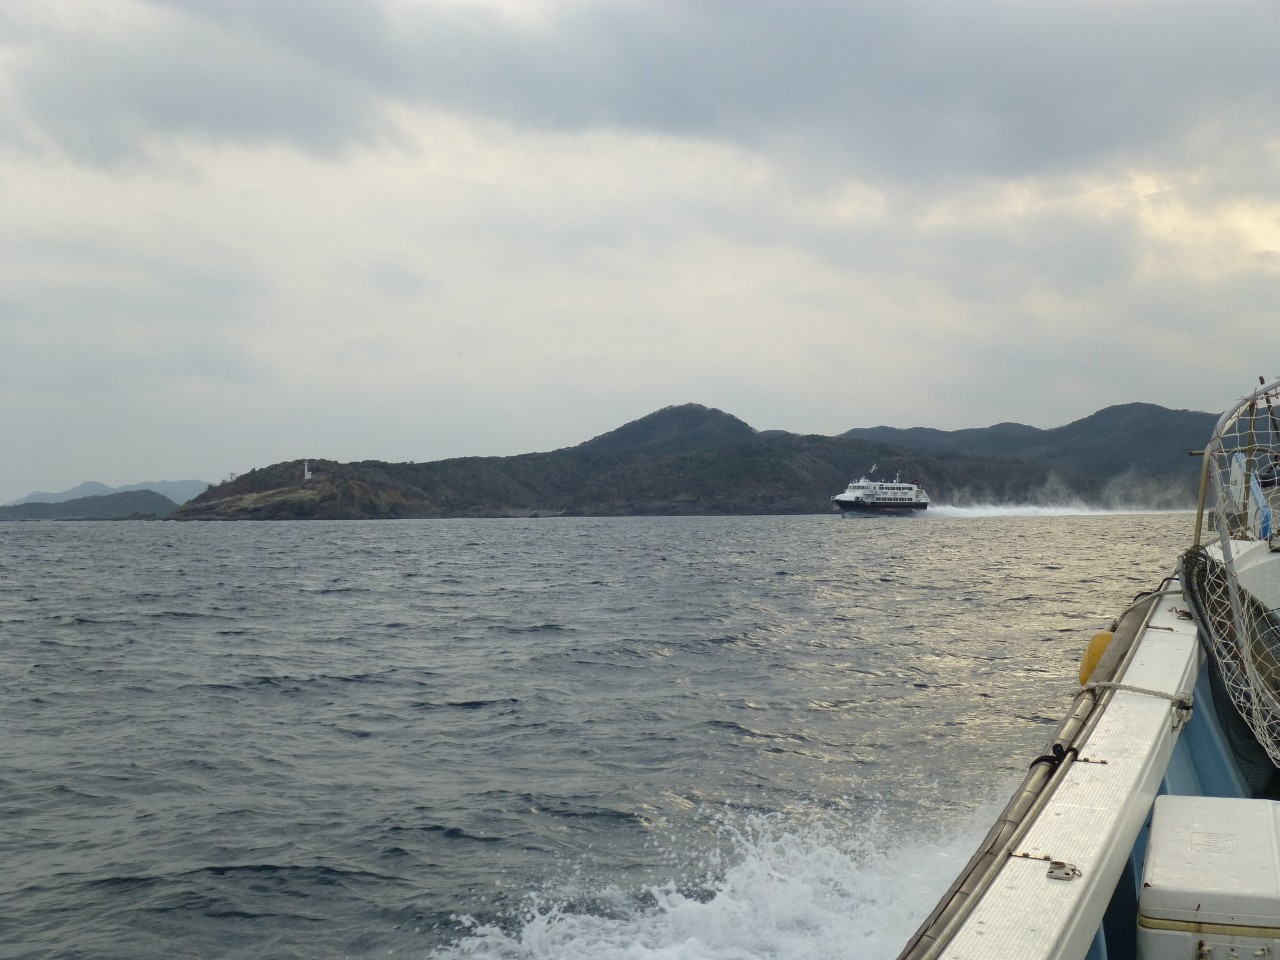 1月5日比田勝港出口 高速艇ビートル釜山へ 本船帰港